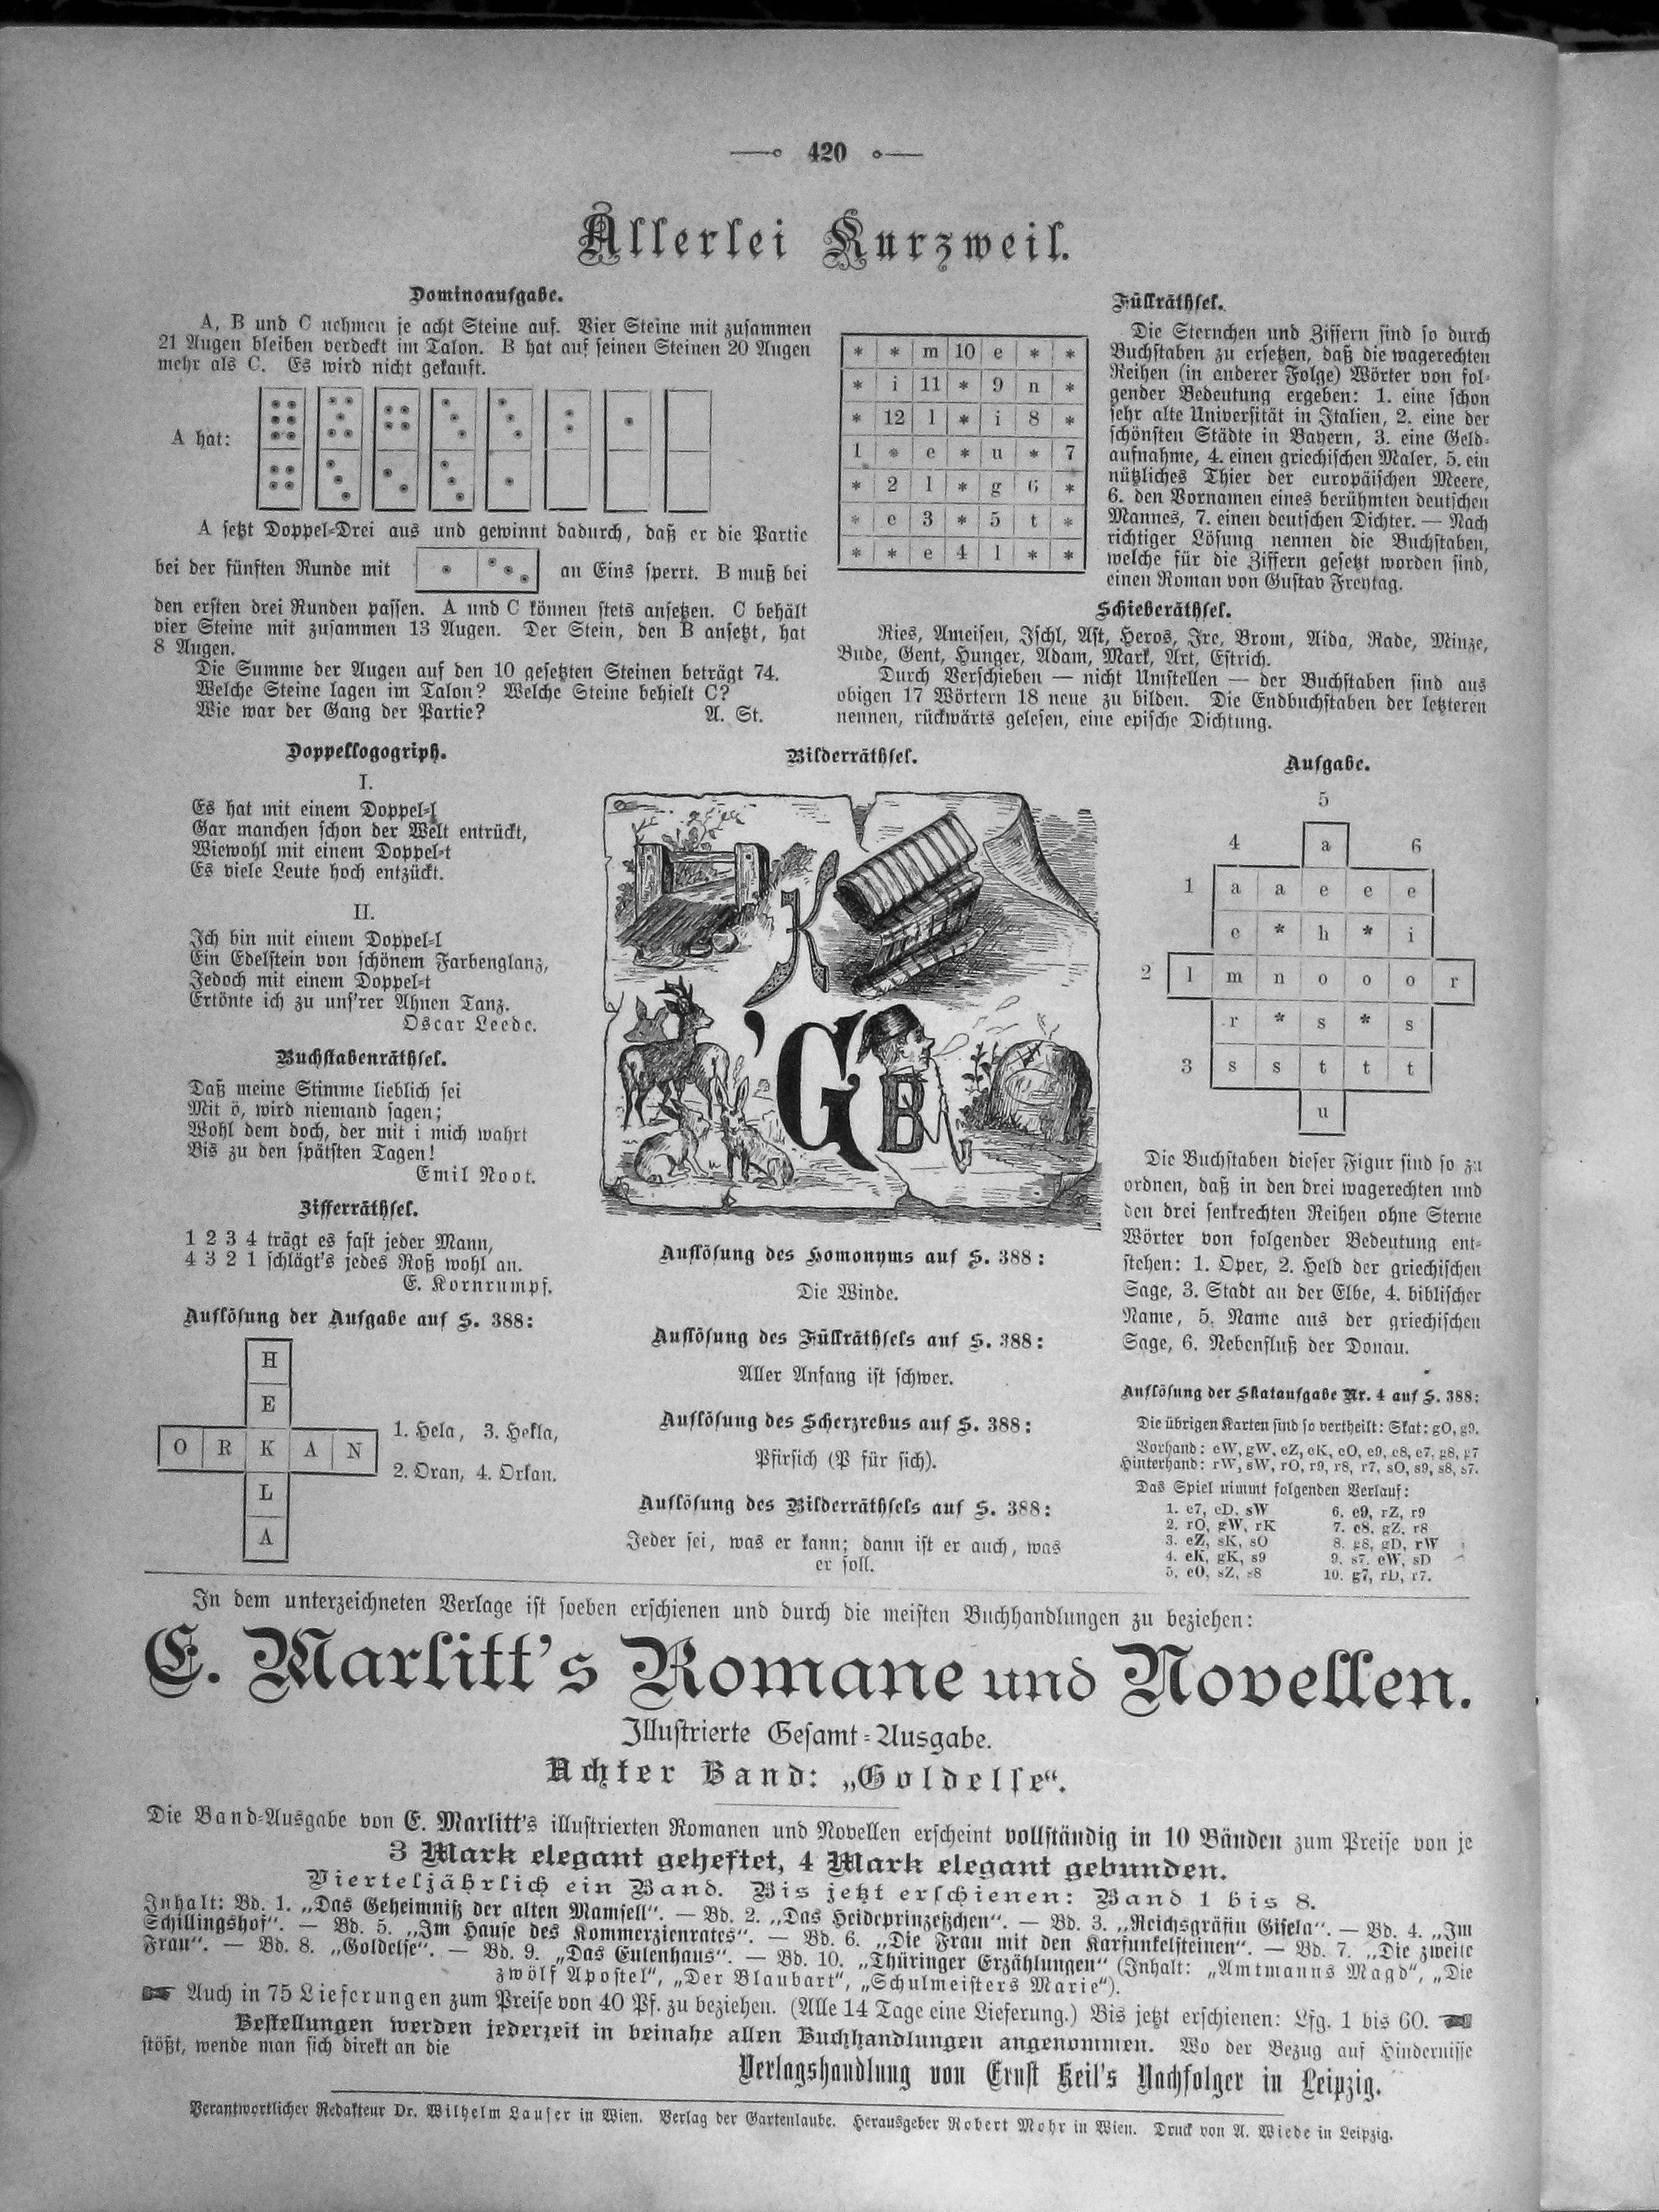 Filedie Gartenlaube 1890 420jpg Wikimedia Commons